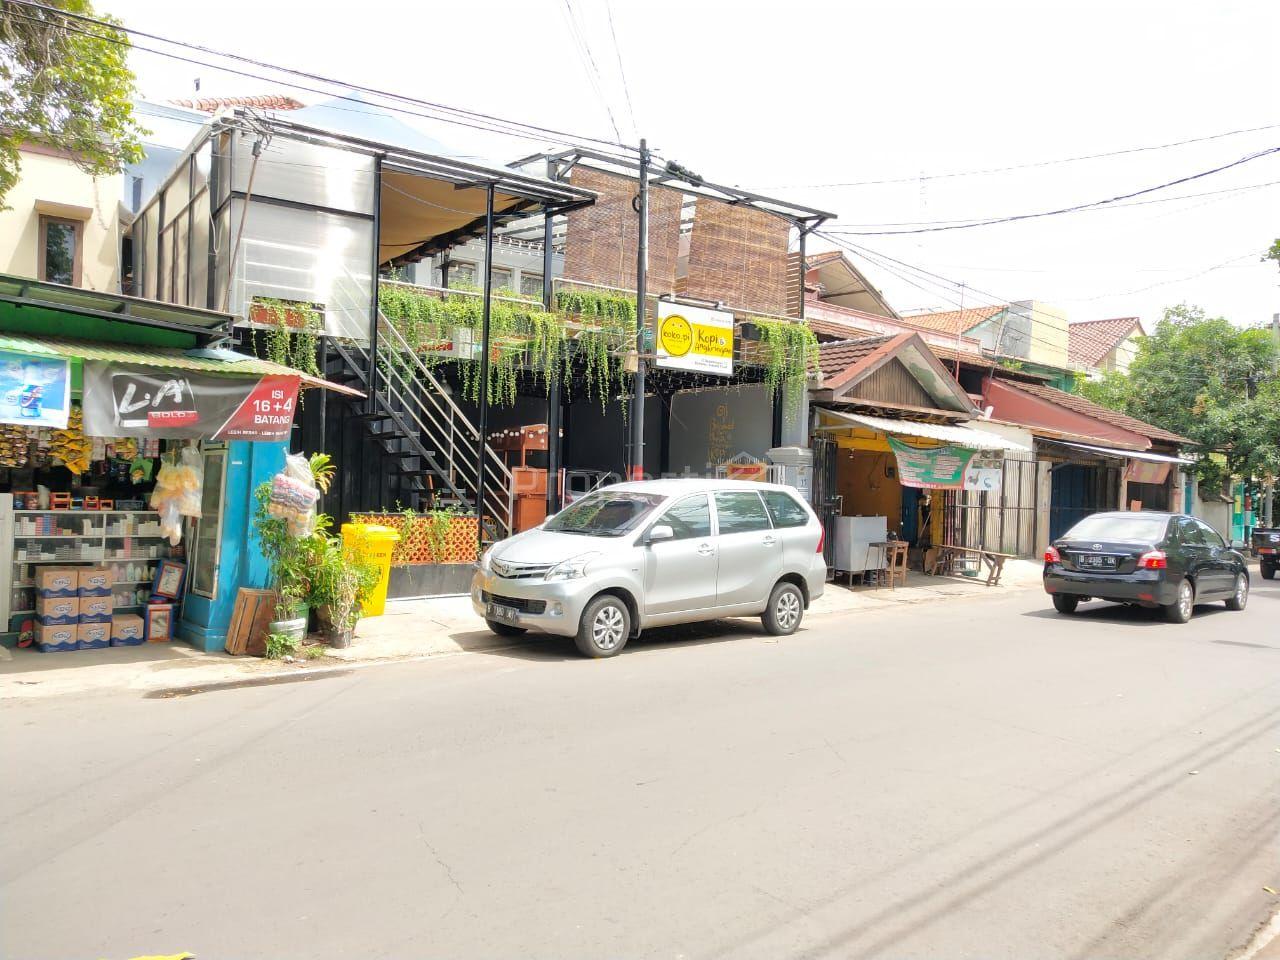 Rumah Kost dan Cafe di Cempaka Putih, DKI Jakarta